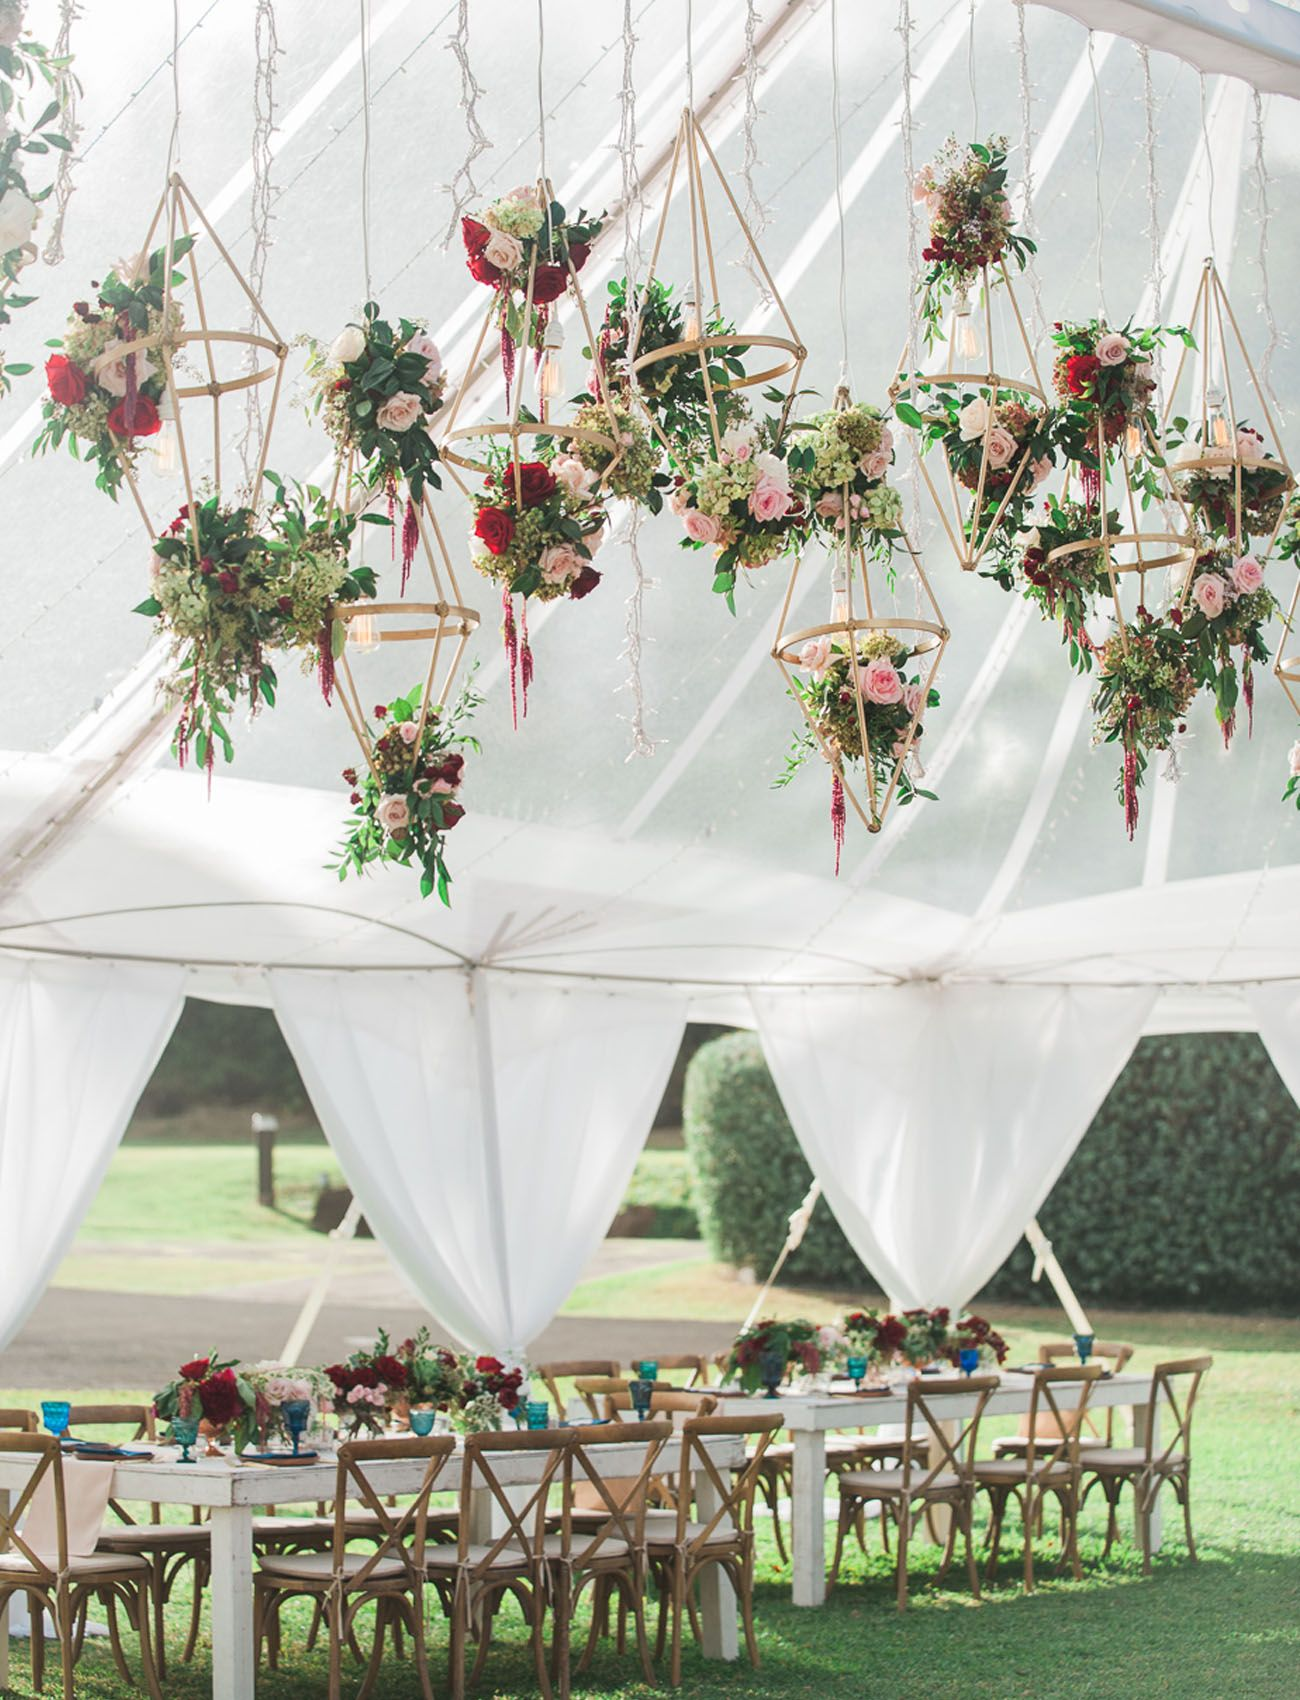 Audrina Patridge Corey Bohan S Boho Chic Kauai Wedding Florals Floral Wedding Decorations